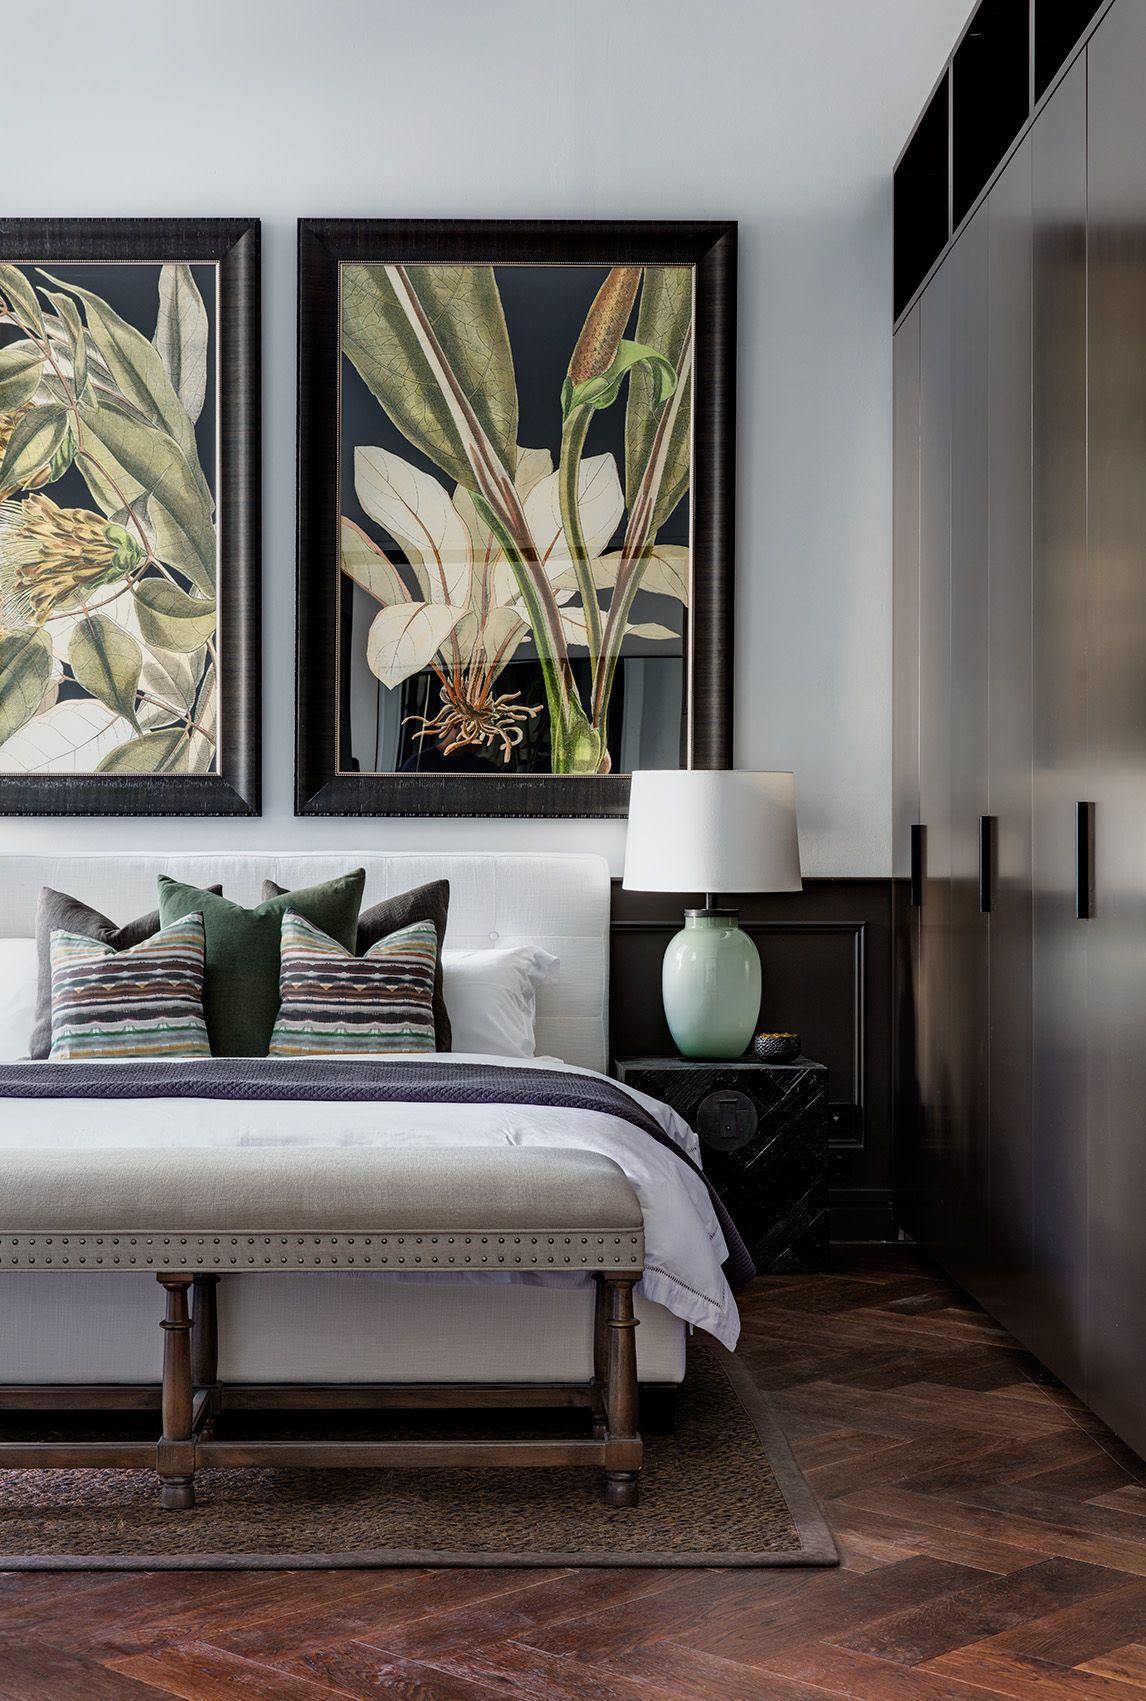 Elegant bedroom interior design property styling  rushcutters bay  arte rinata  pinterest